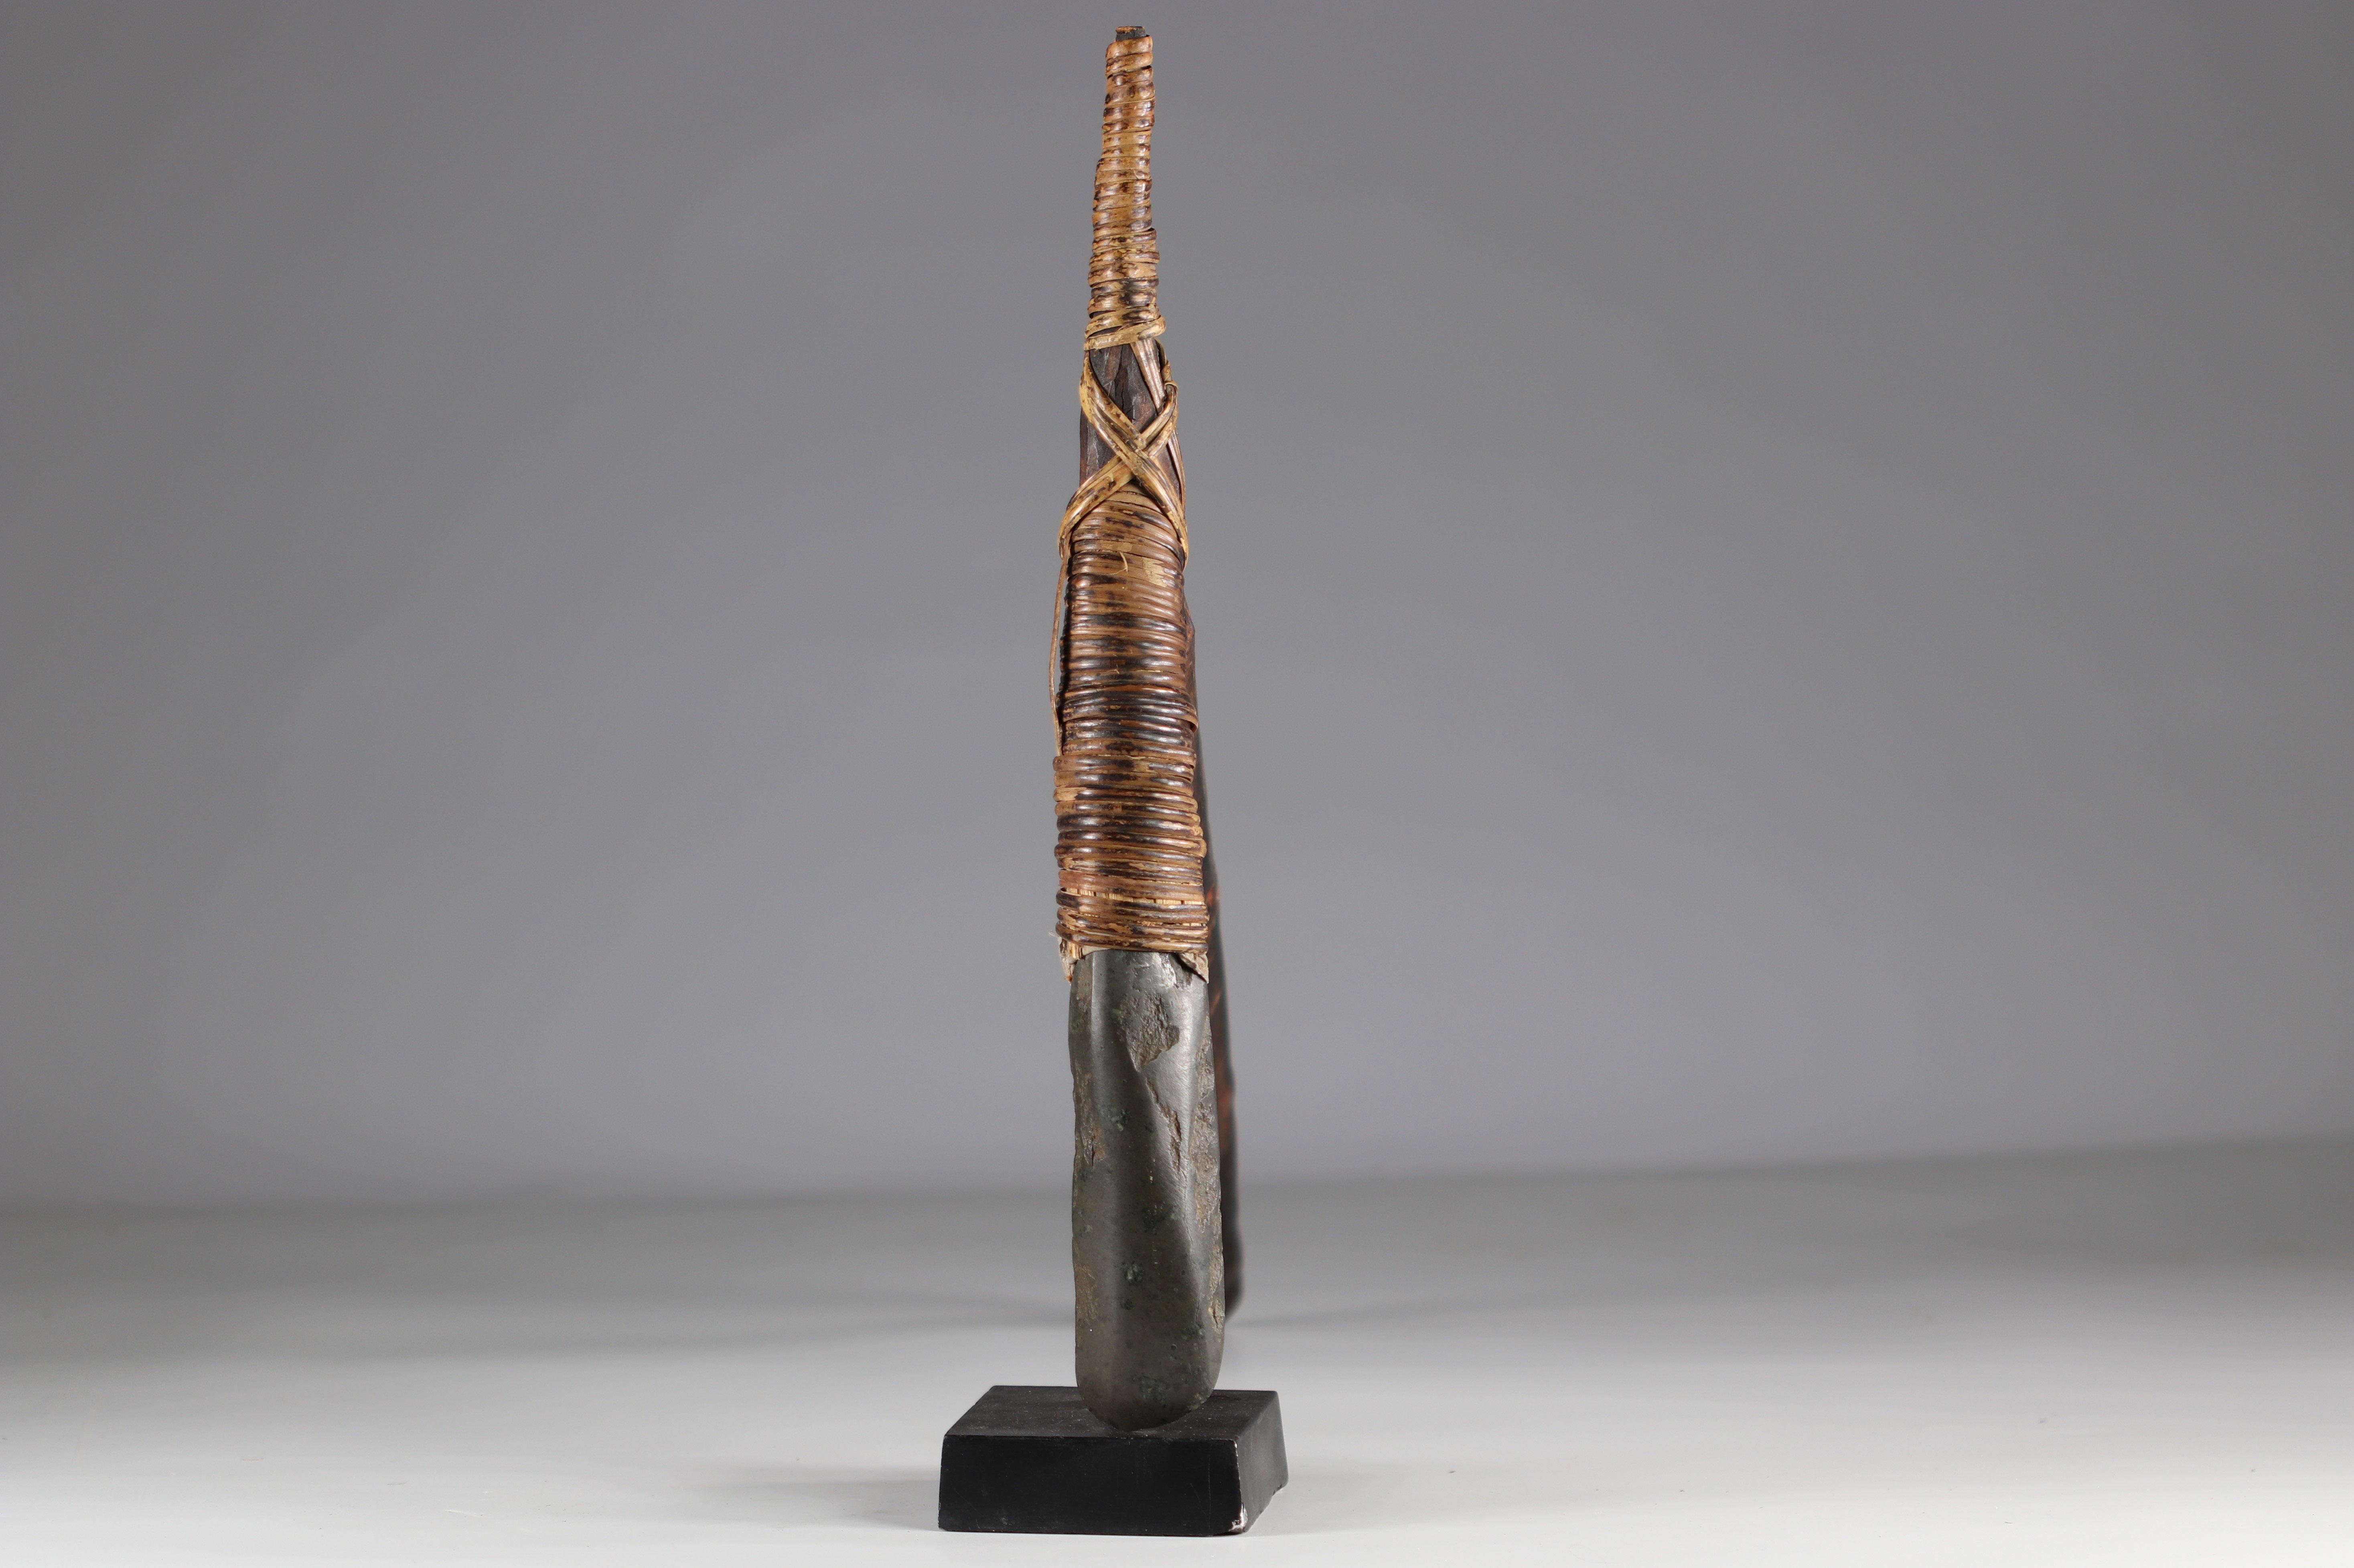 Asmat ax - original stone - Papua New Guinea - mid 20th century - Image 2 of 3